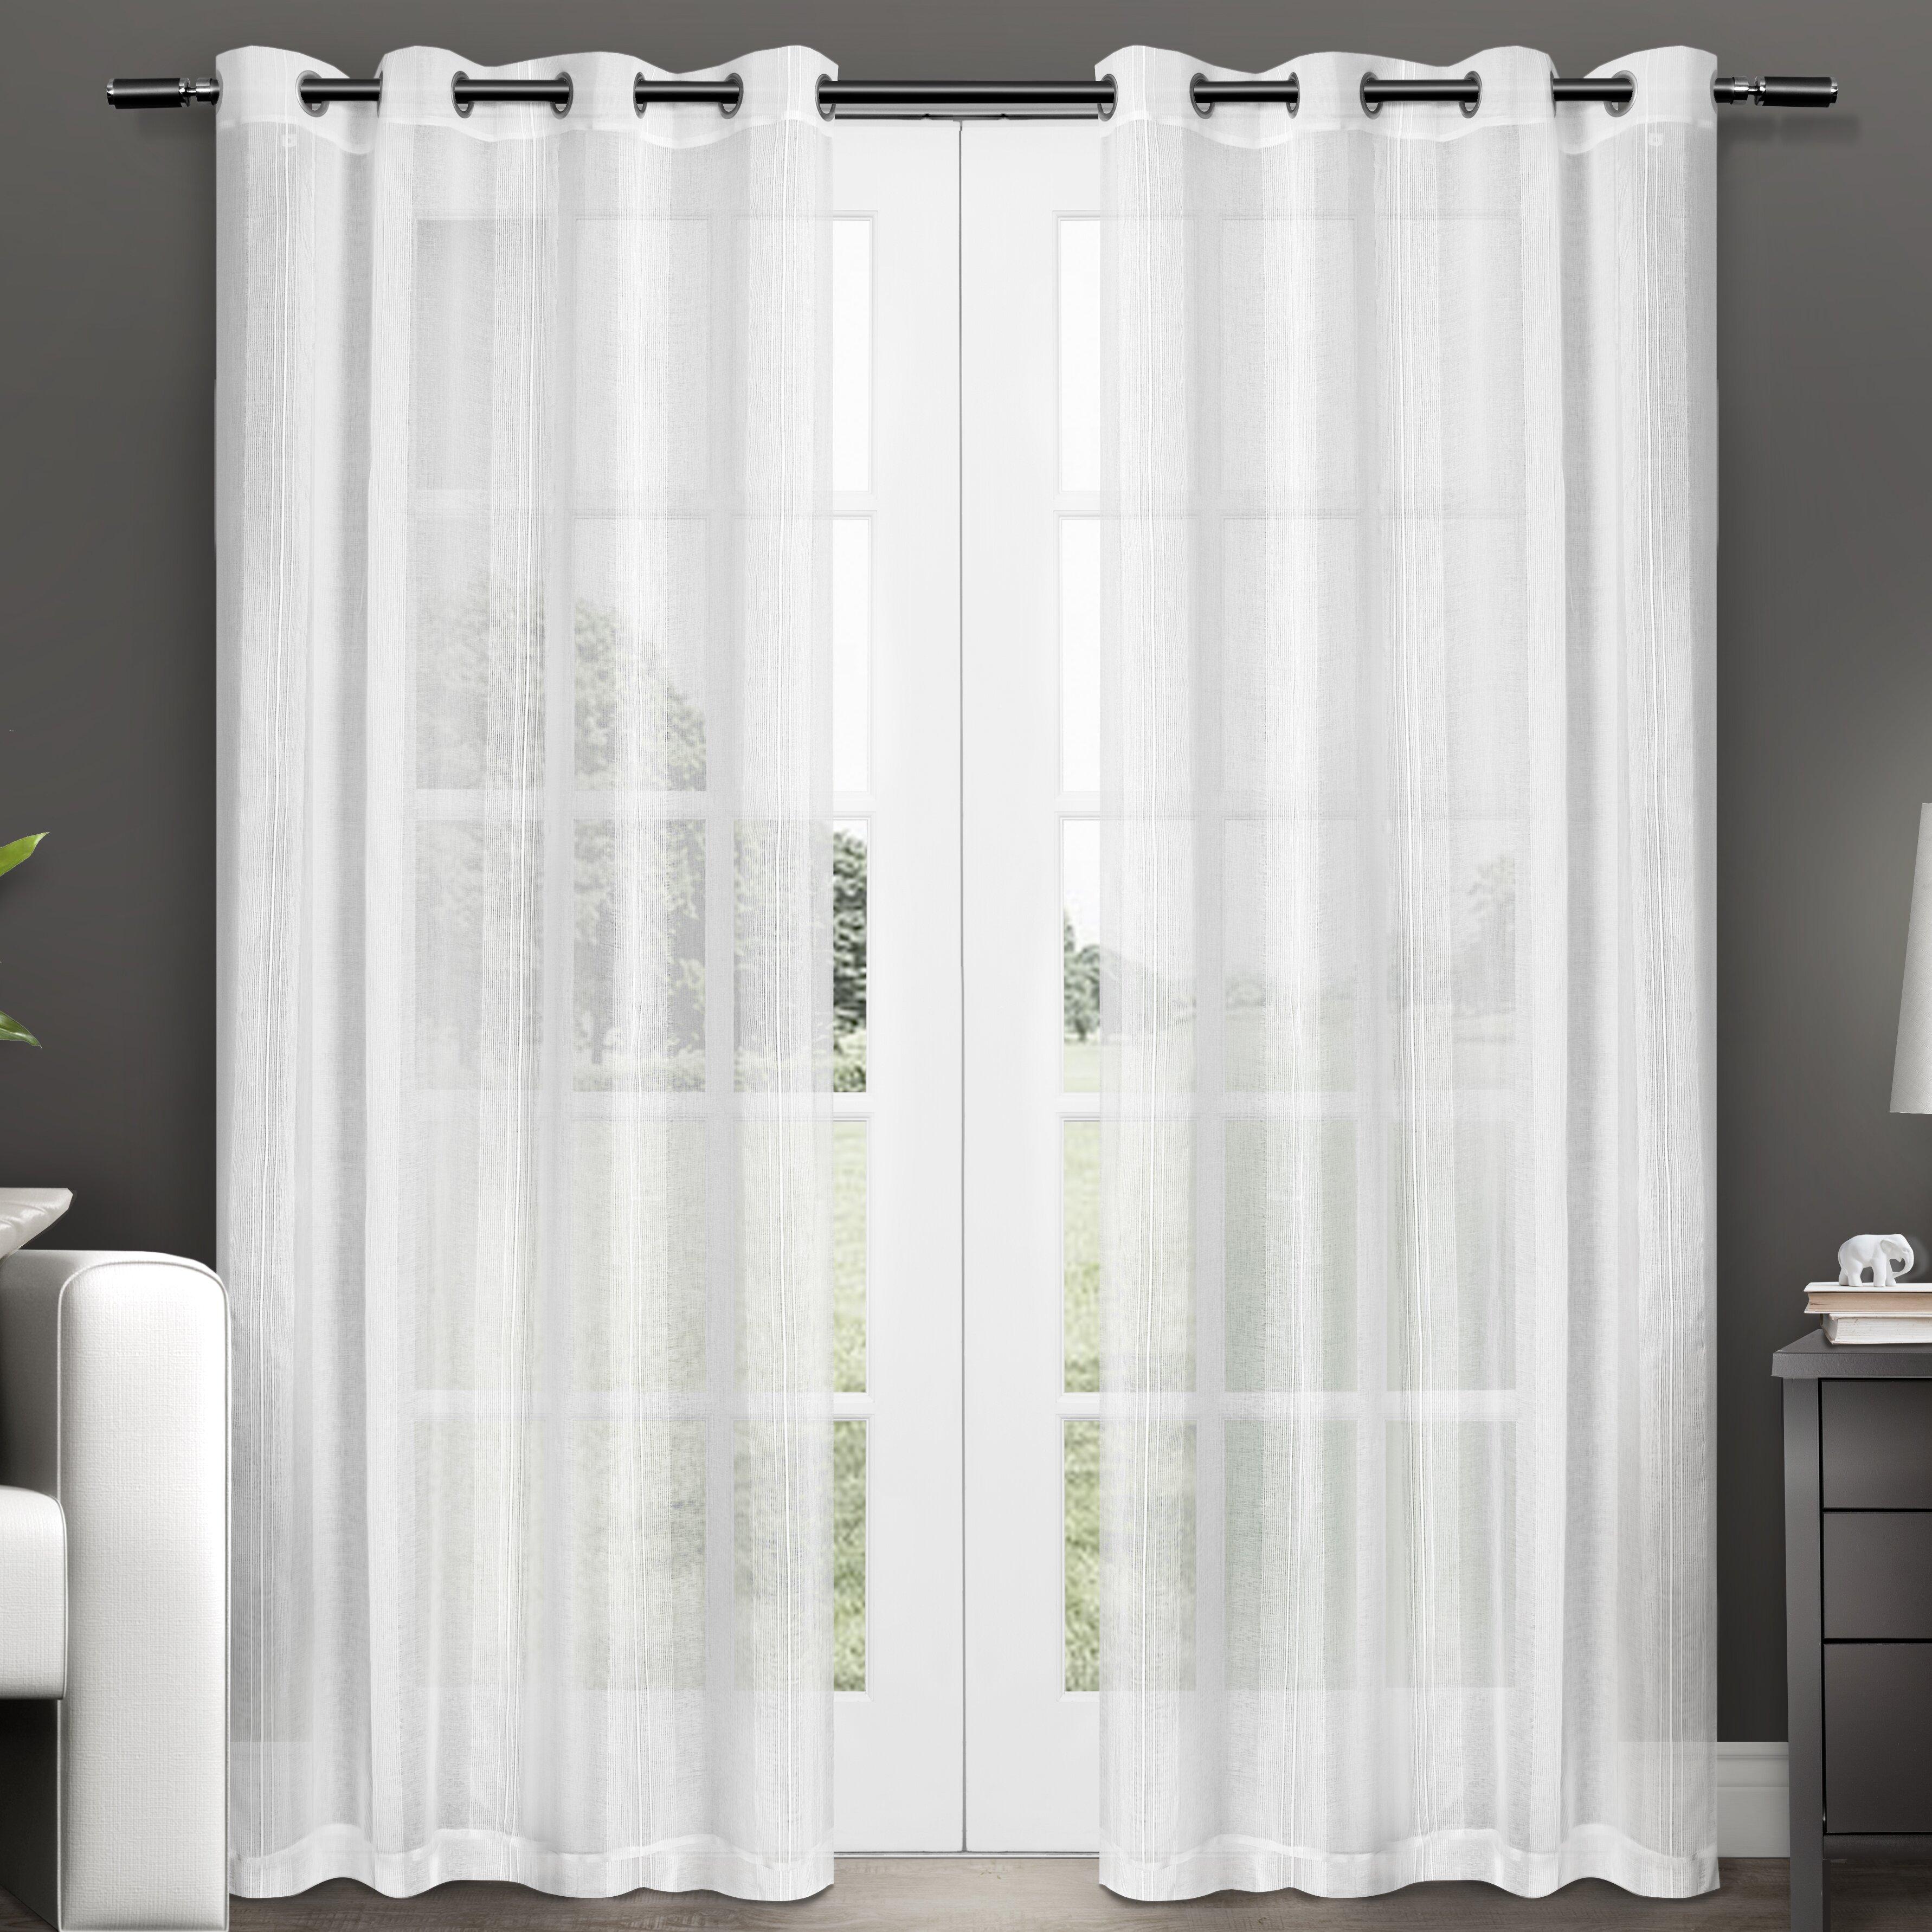 amalgamated textiles exclusive home curtain panels